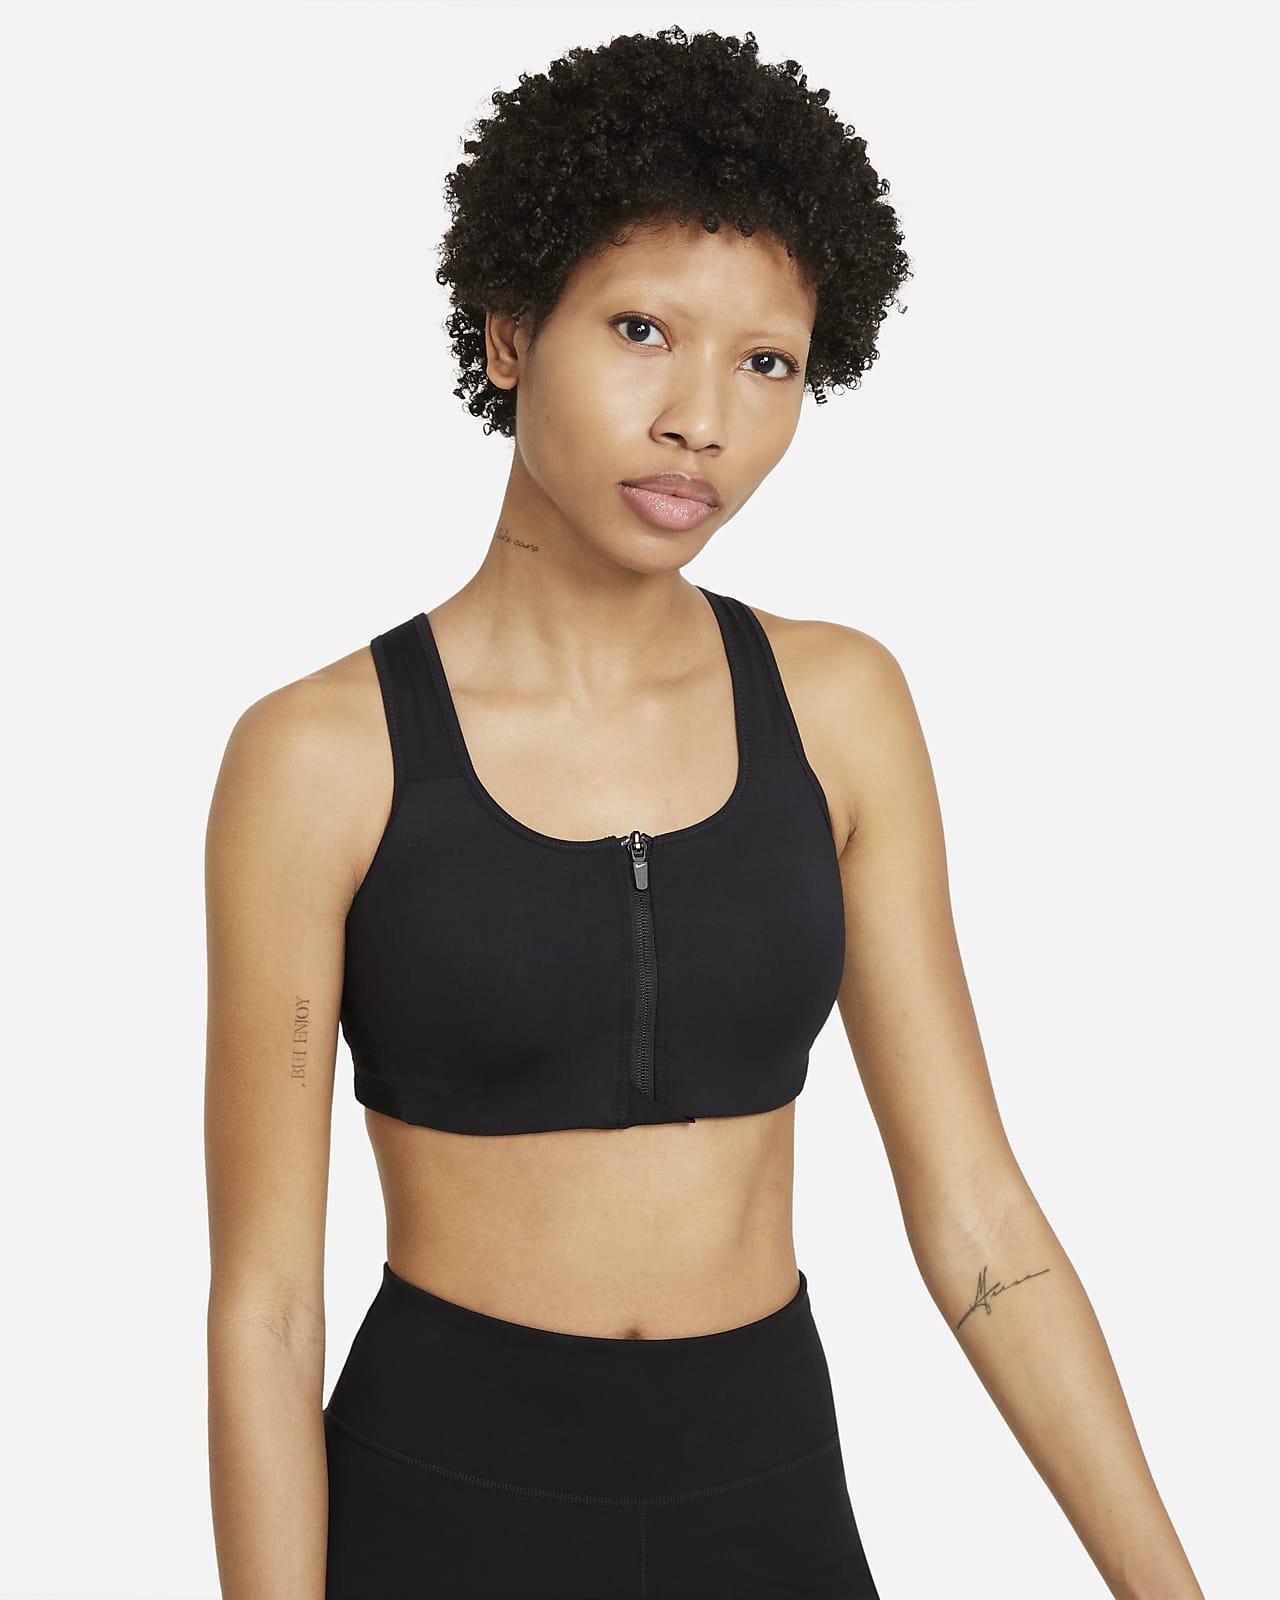 Nike Dri-FIT Shape Women's High-Support Padded Zip-Front Sports Bra